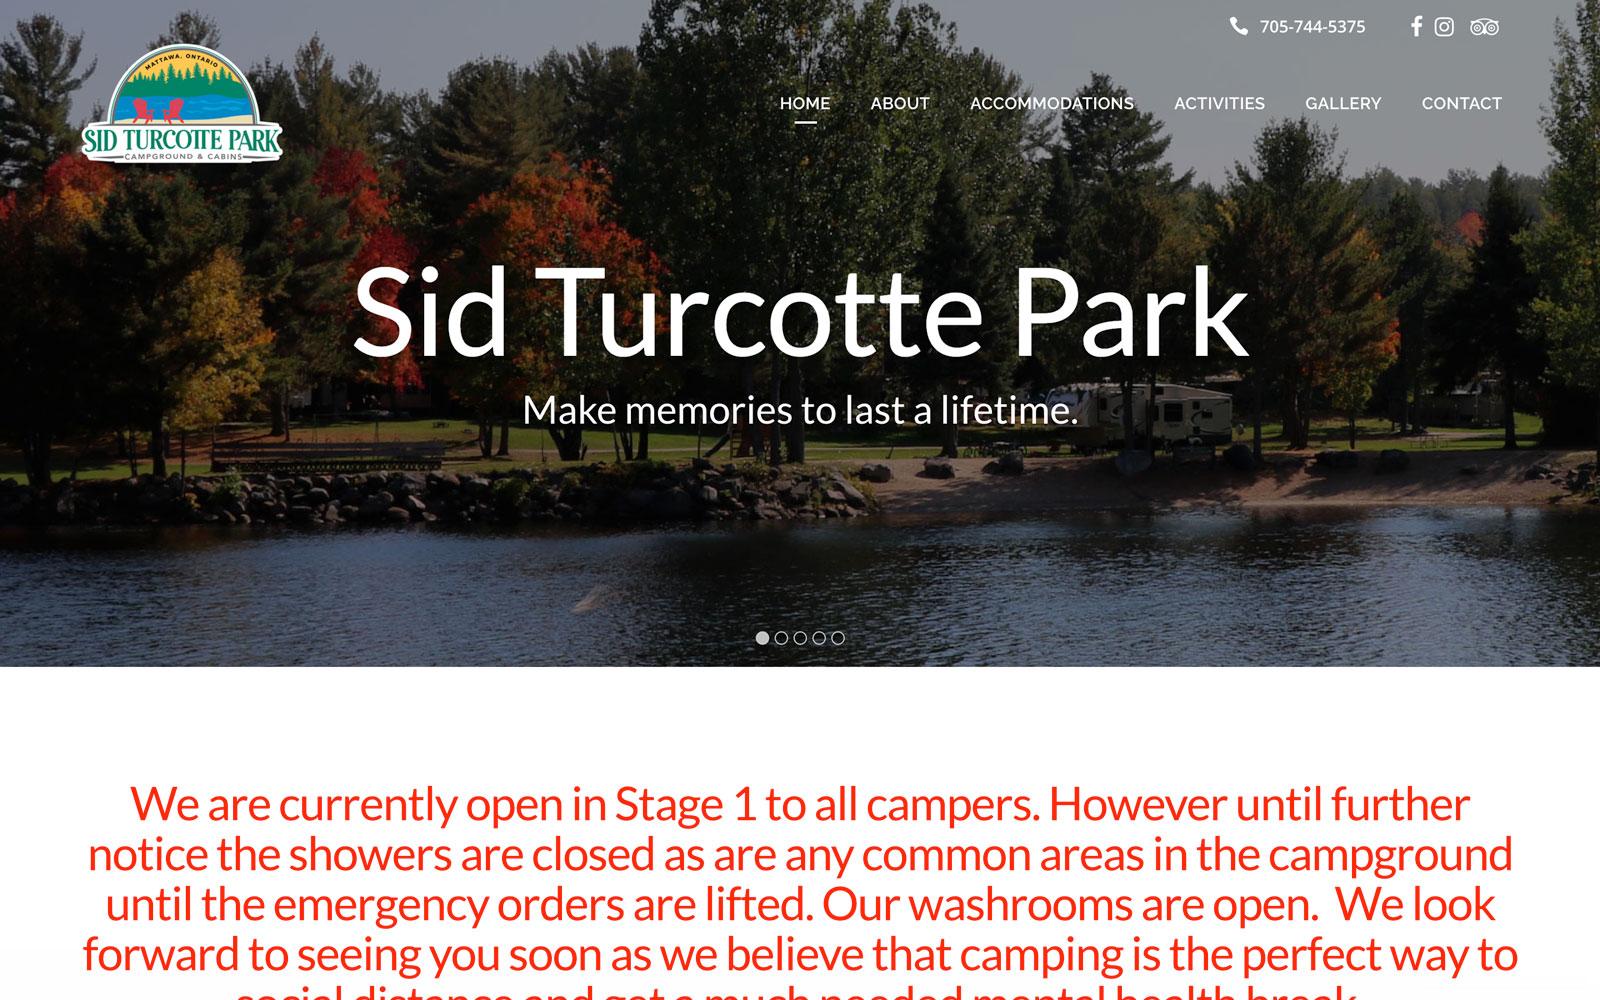 Sid Turcotte Park Website